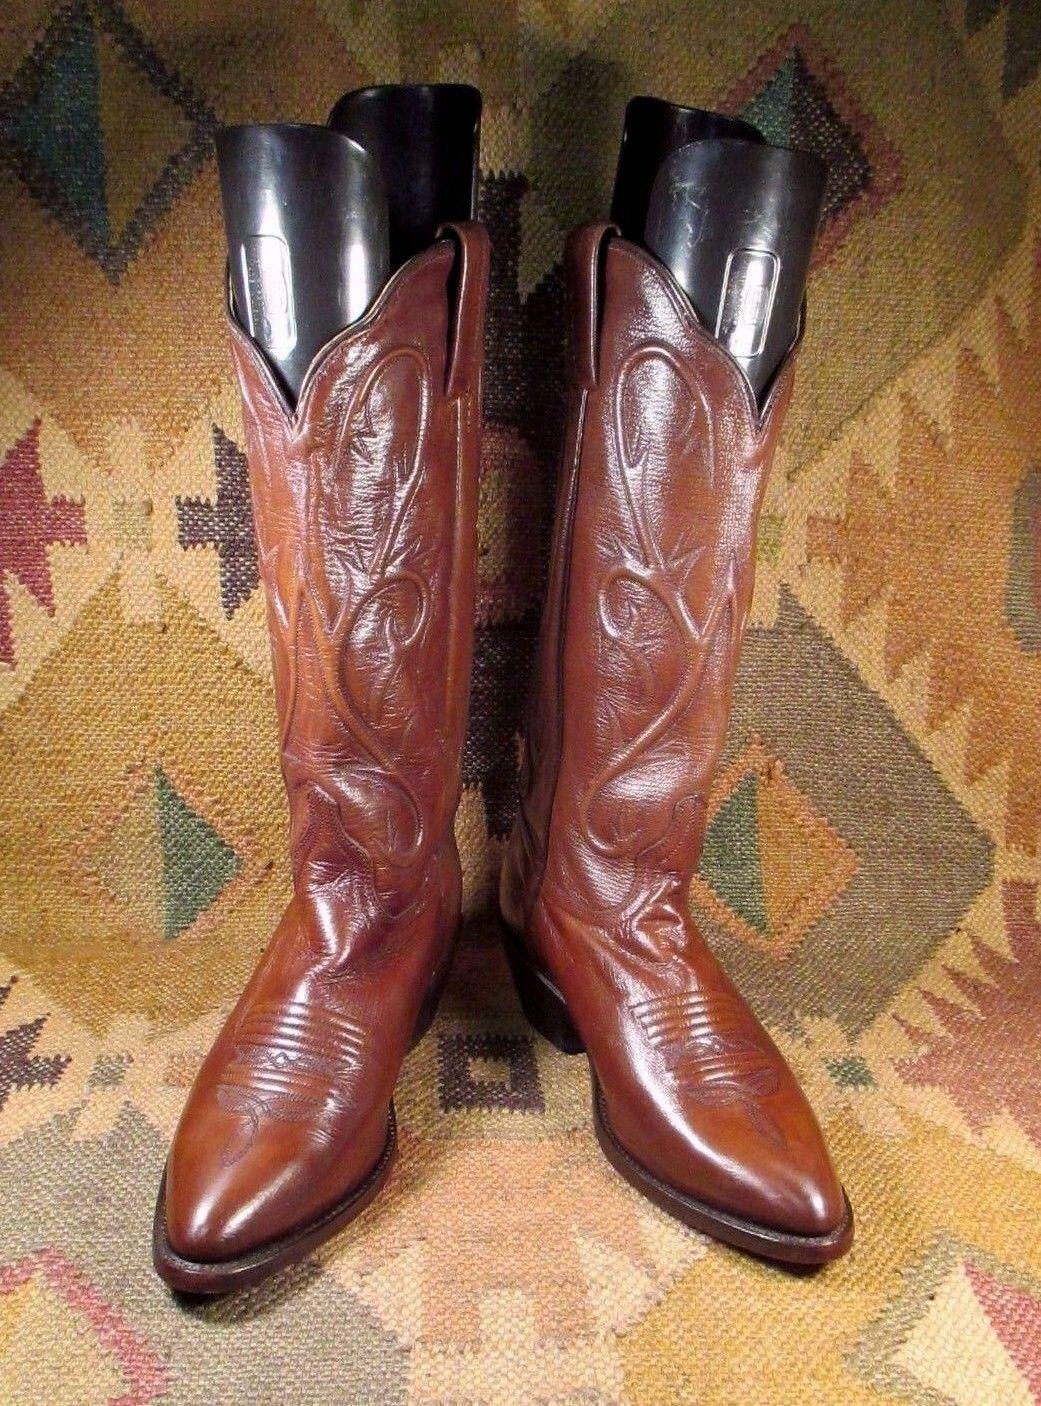 VINTAGE90s DAN POST CP 3211 BROWN LEATHER COWBOY M WESTERN BOOTS size 7.5 M COWBOY MEXICO dfbbab